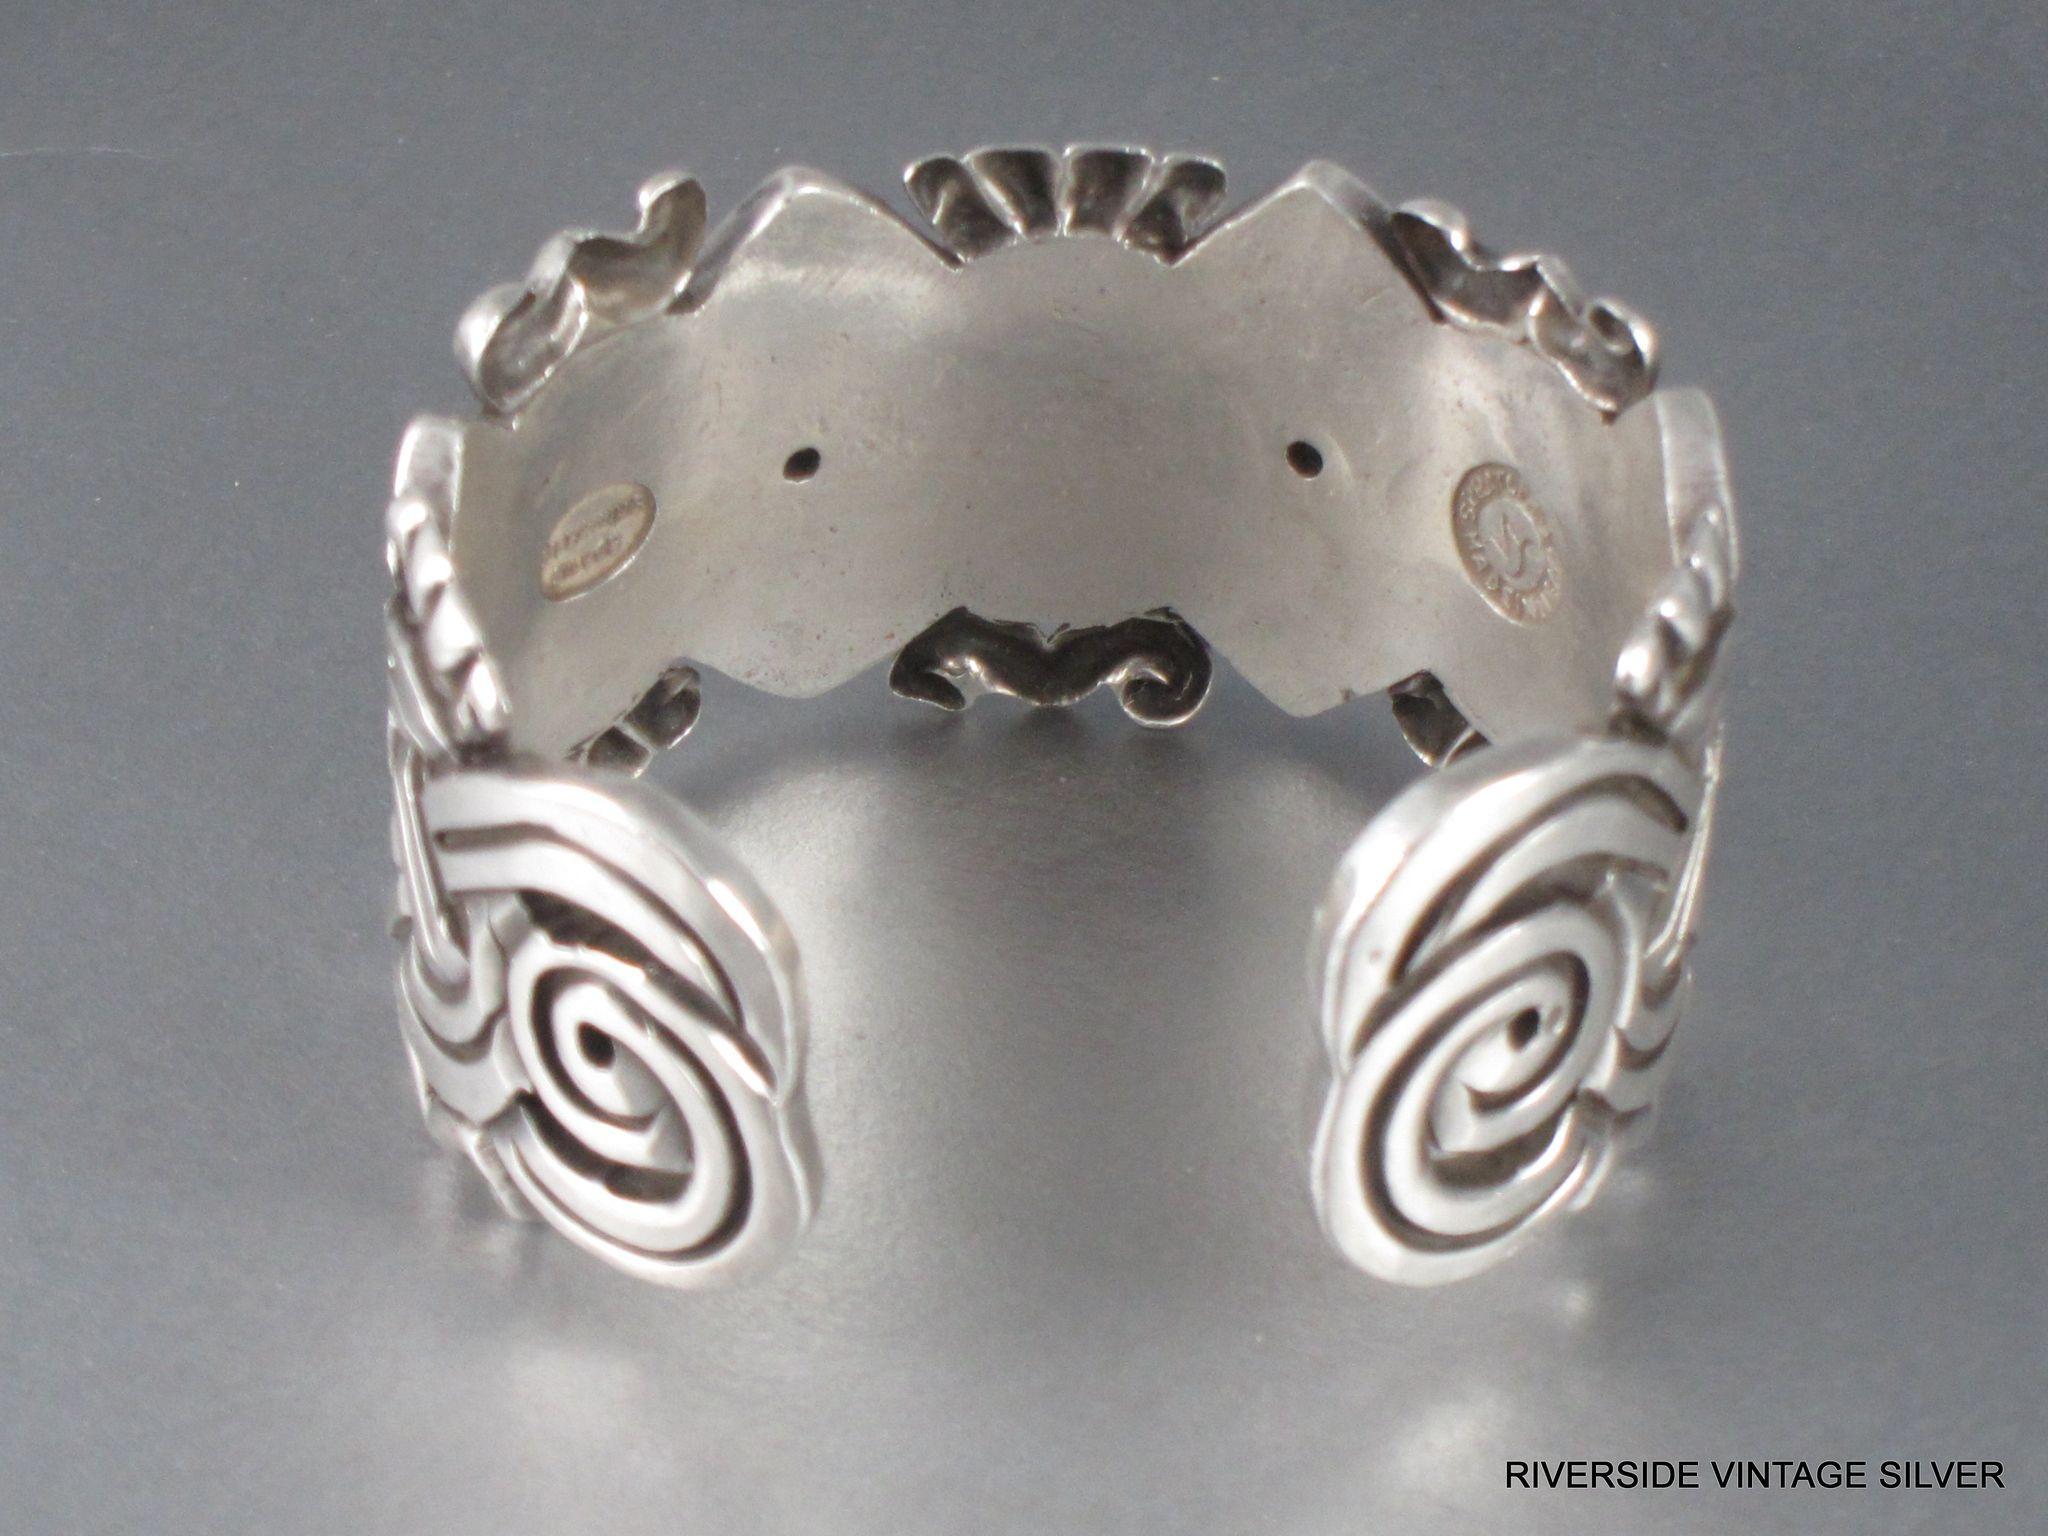 William Spratling Aztec Sterling Silver Cuff Bracelet